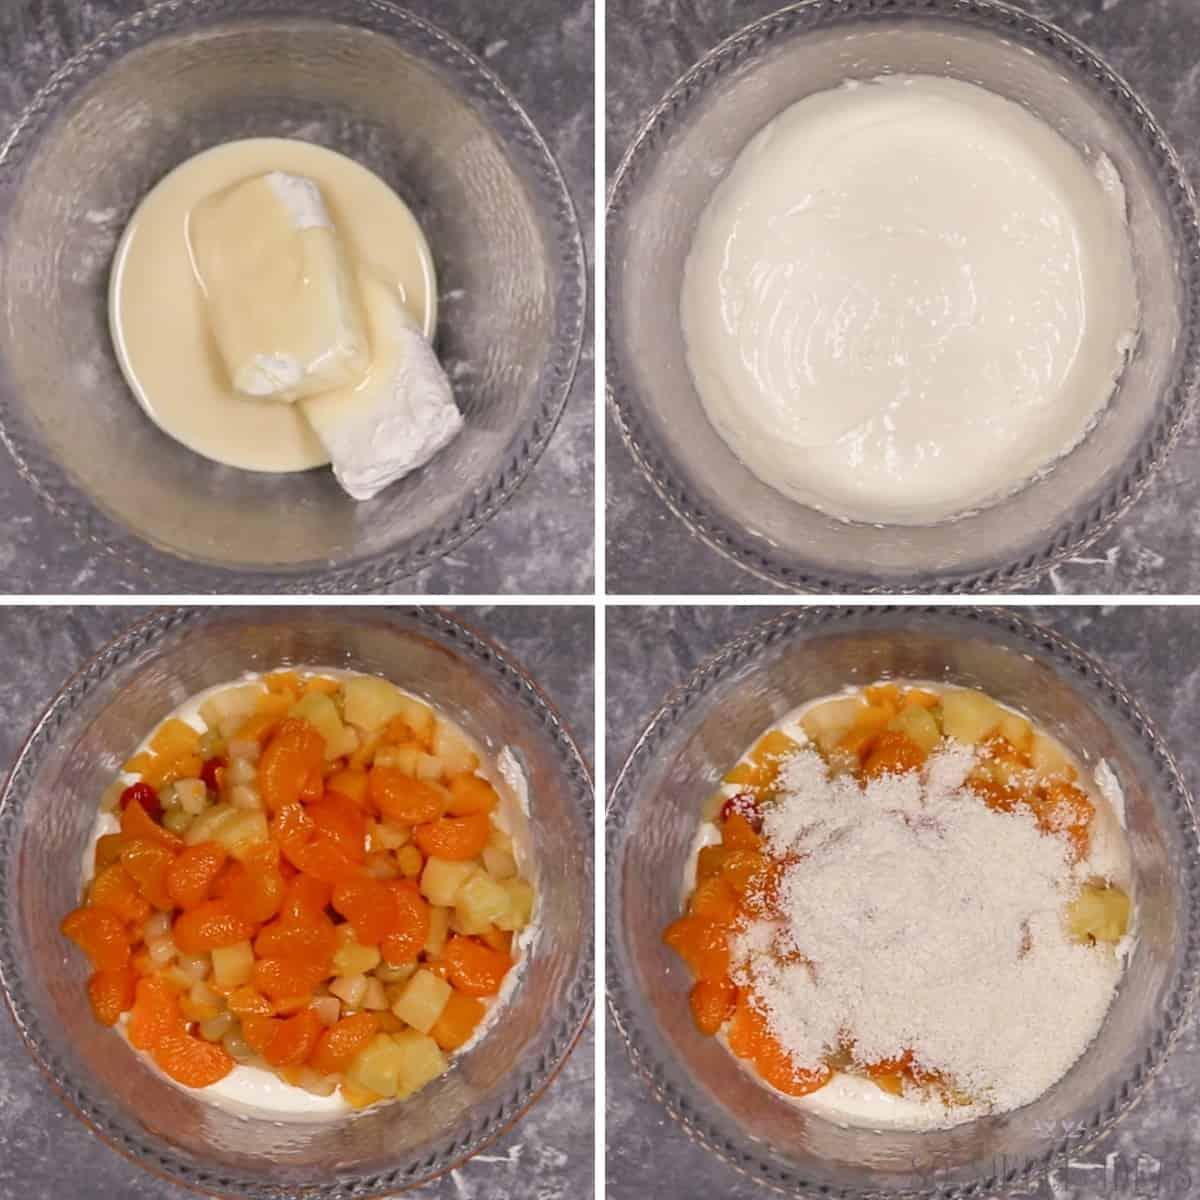 preparing the recipe in a mixing bowl